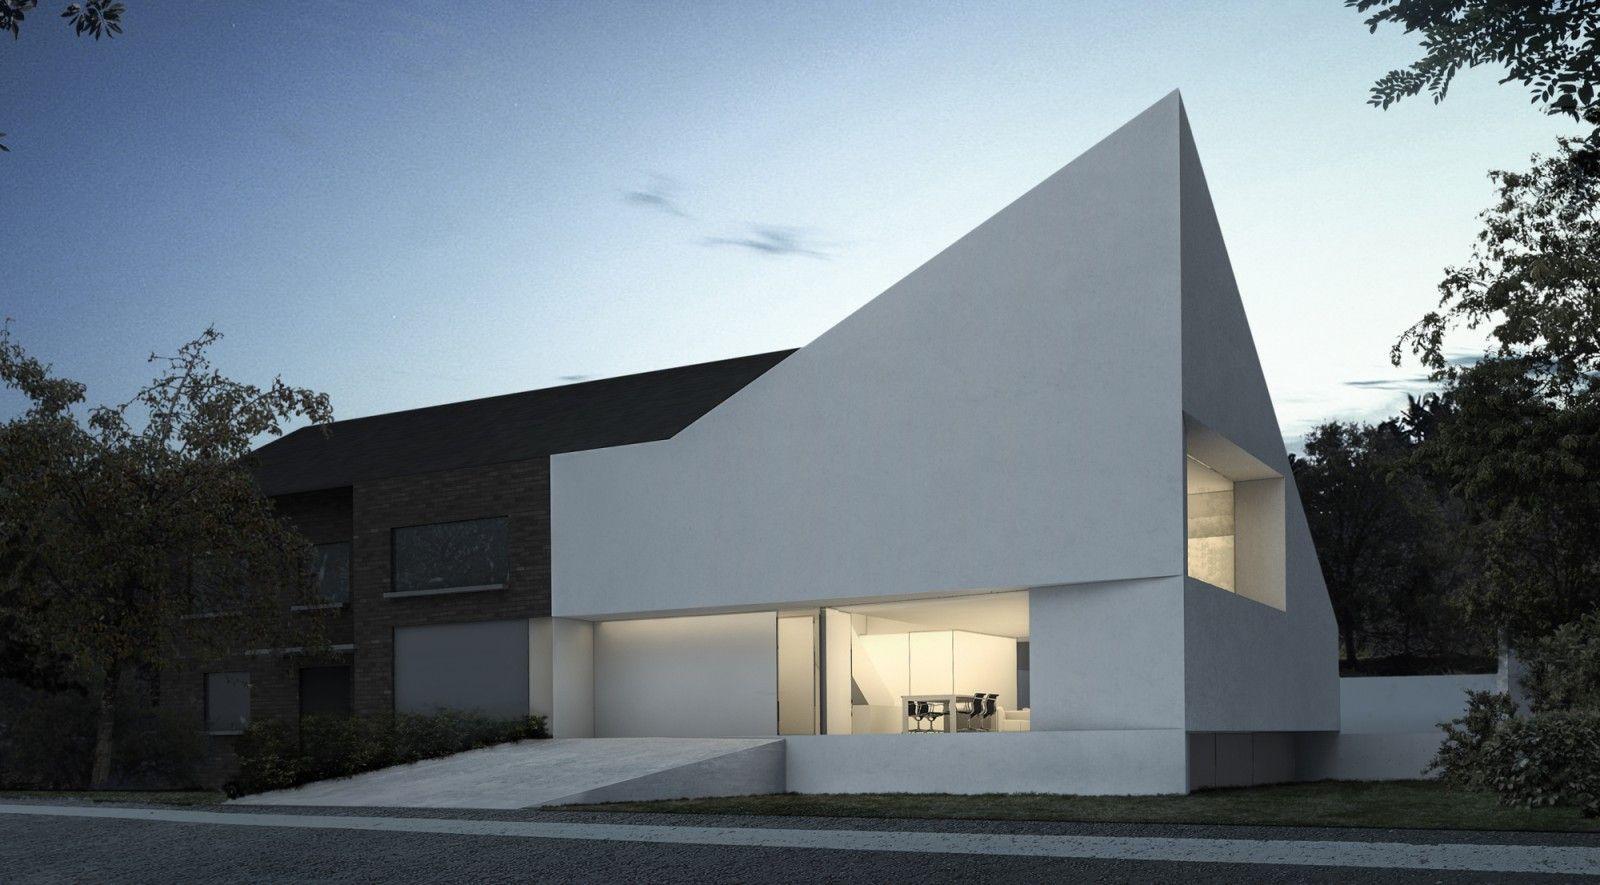 Fran Silvestre Arquitectos - House in Brussels